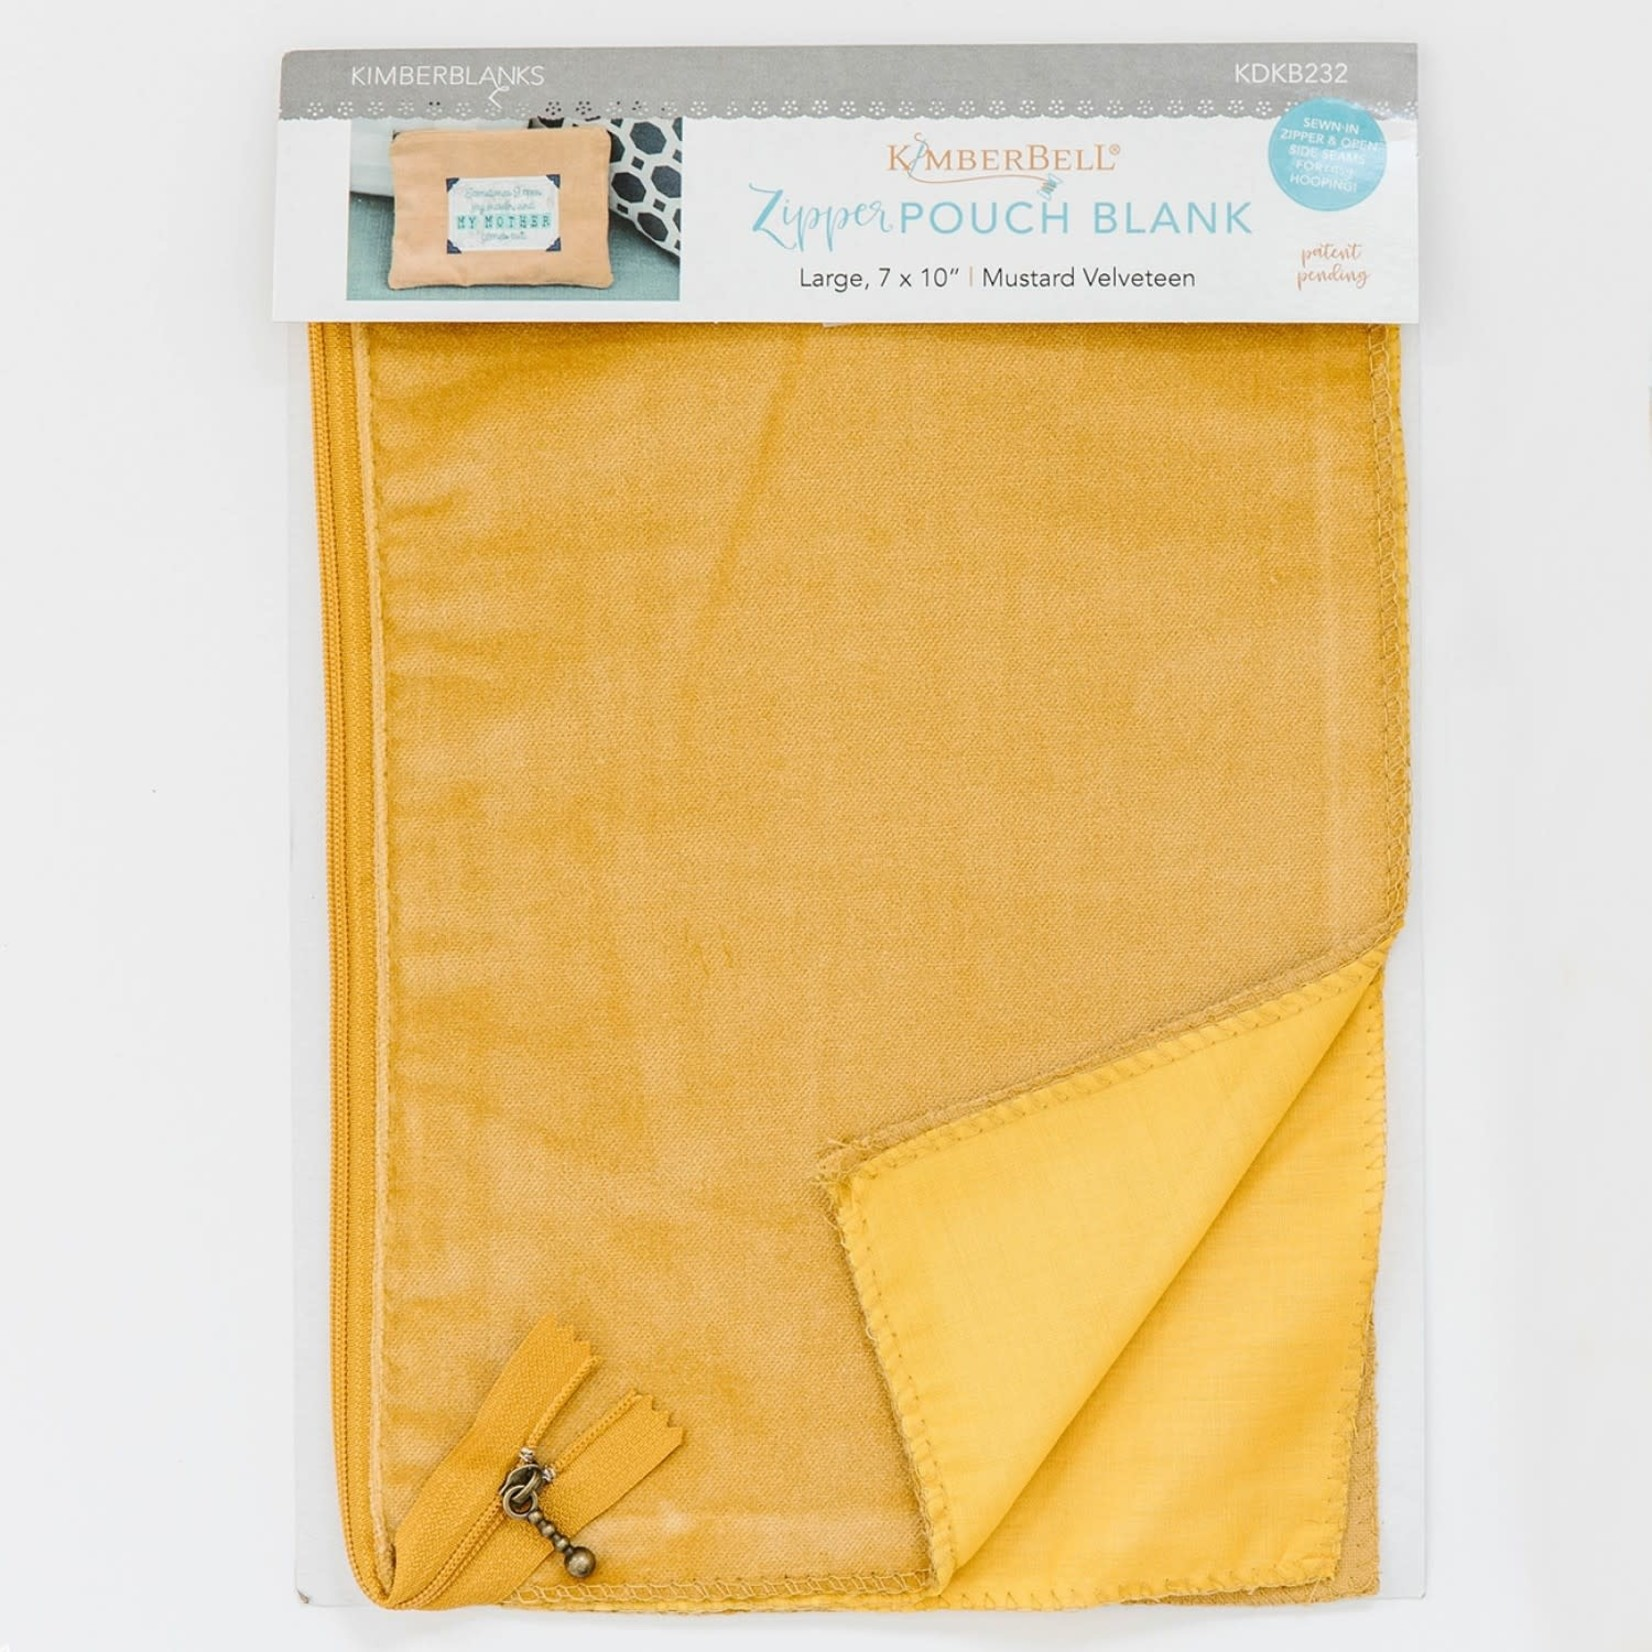 Kimberbell Designs Mustard Velveteen Zipper Pouch Blank, Large